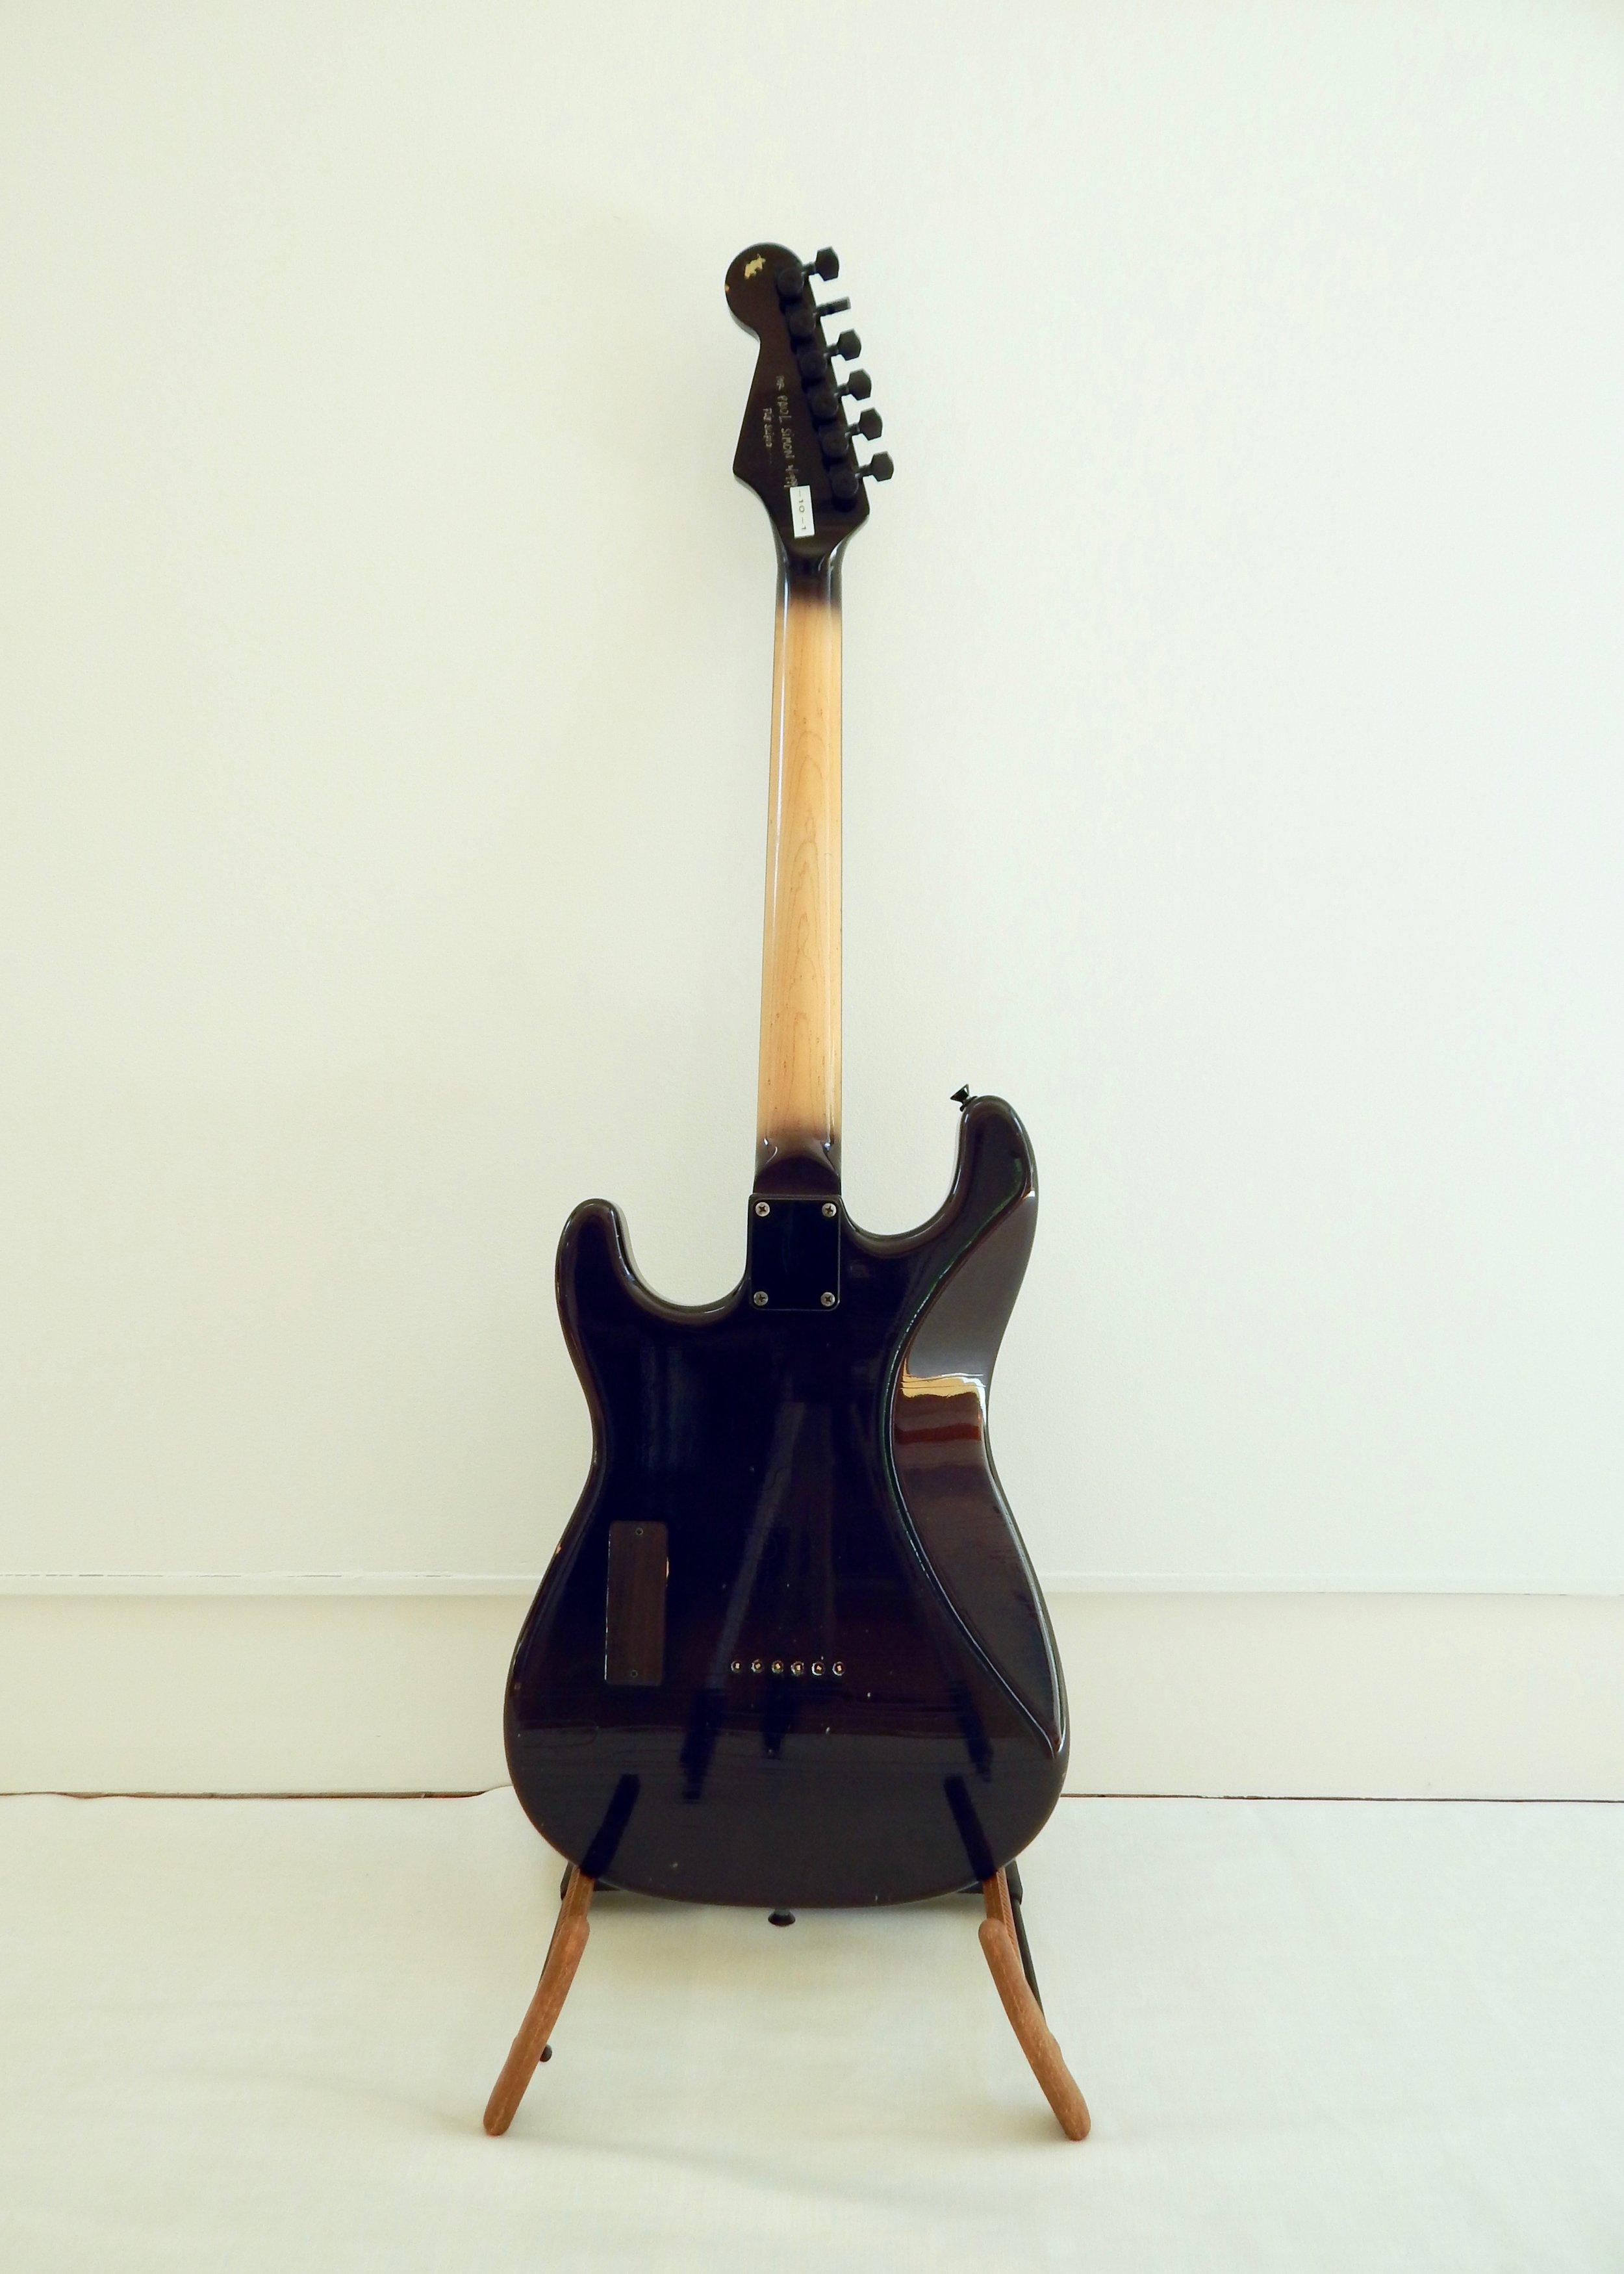 paul simon guitar _back.jpg